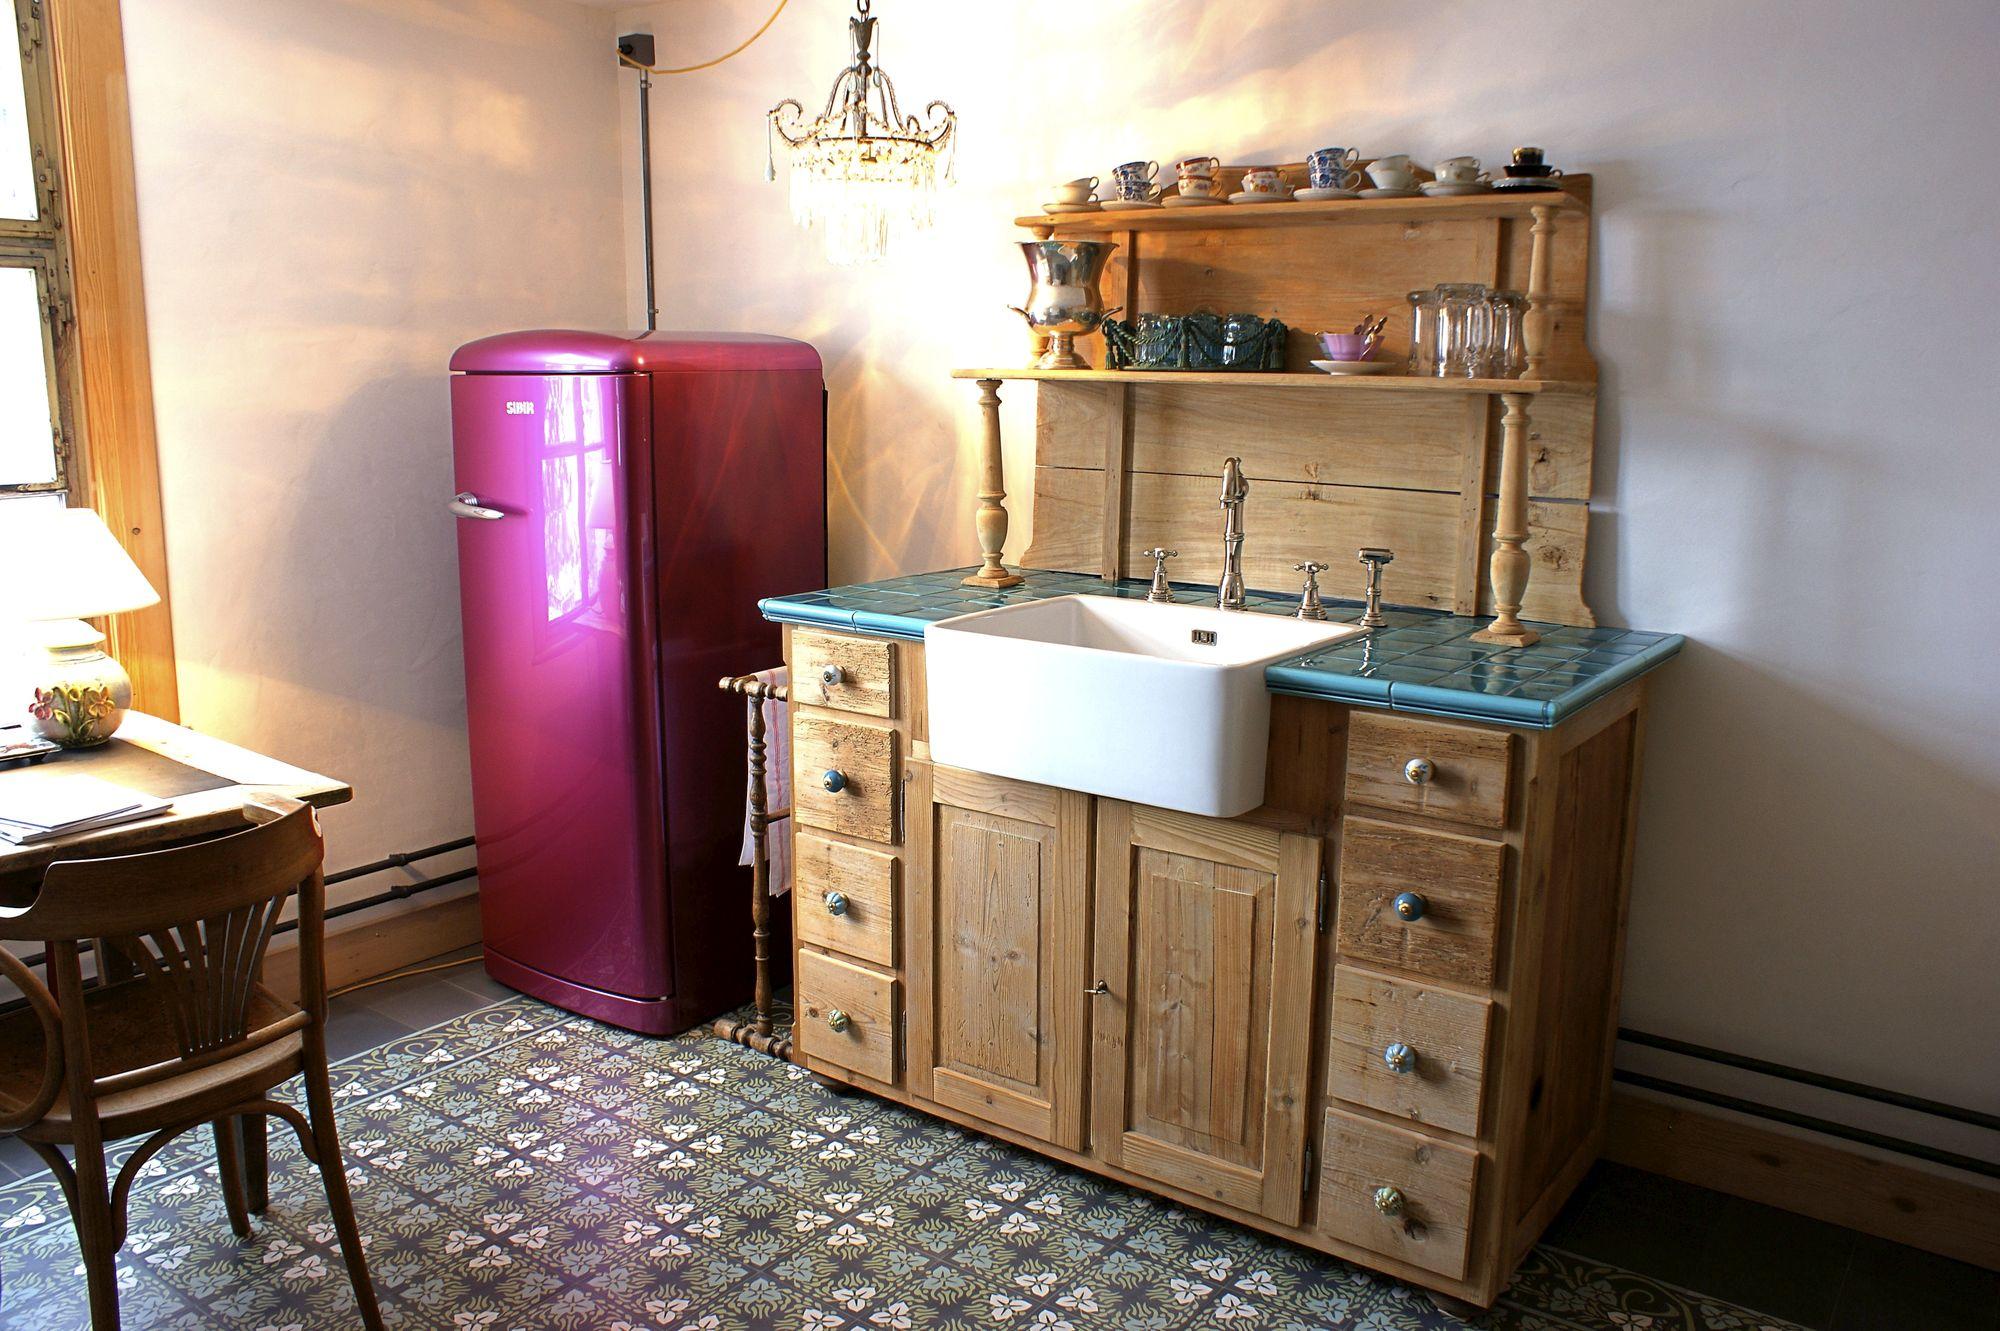 Küchenspüle SINGLE BUTLER aus Keramik in weiss – TRADITIONAL BATHROOMS